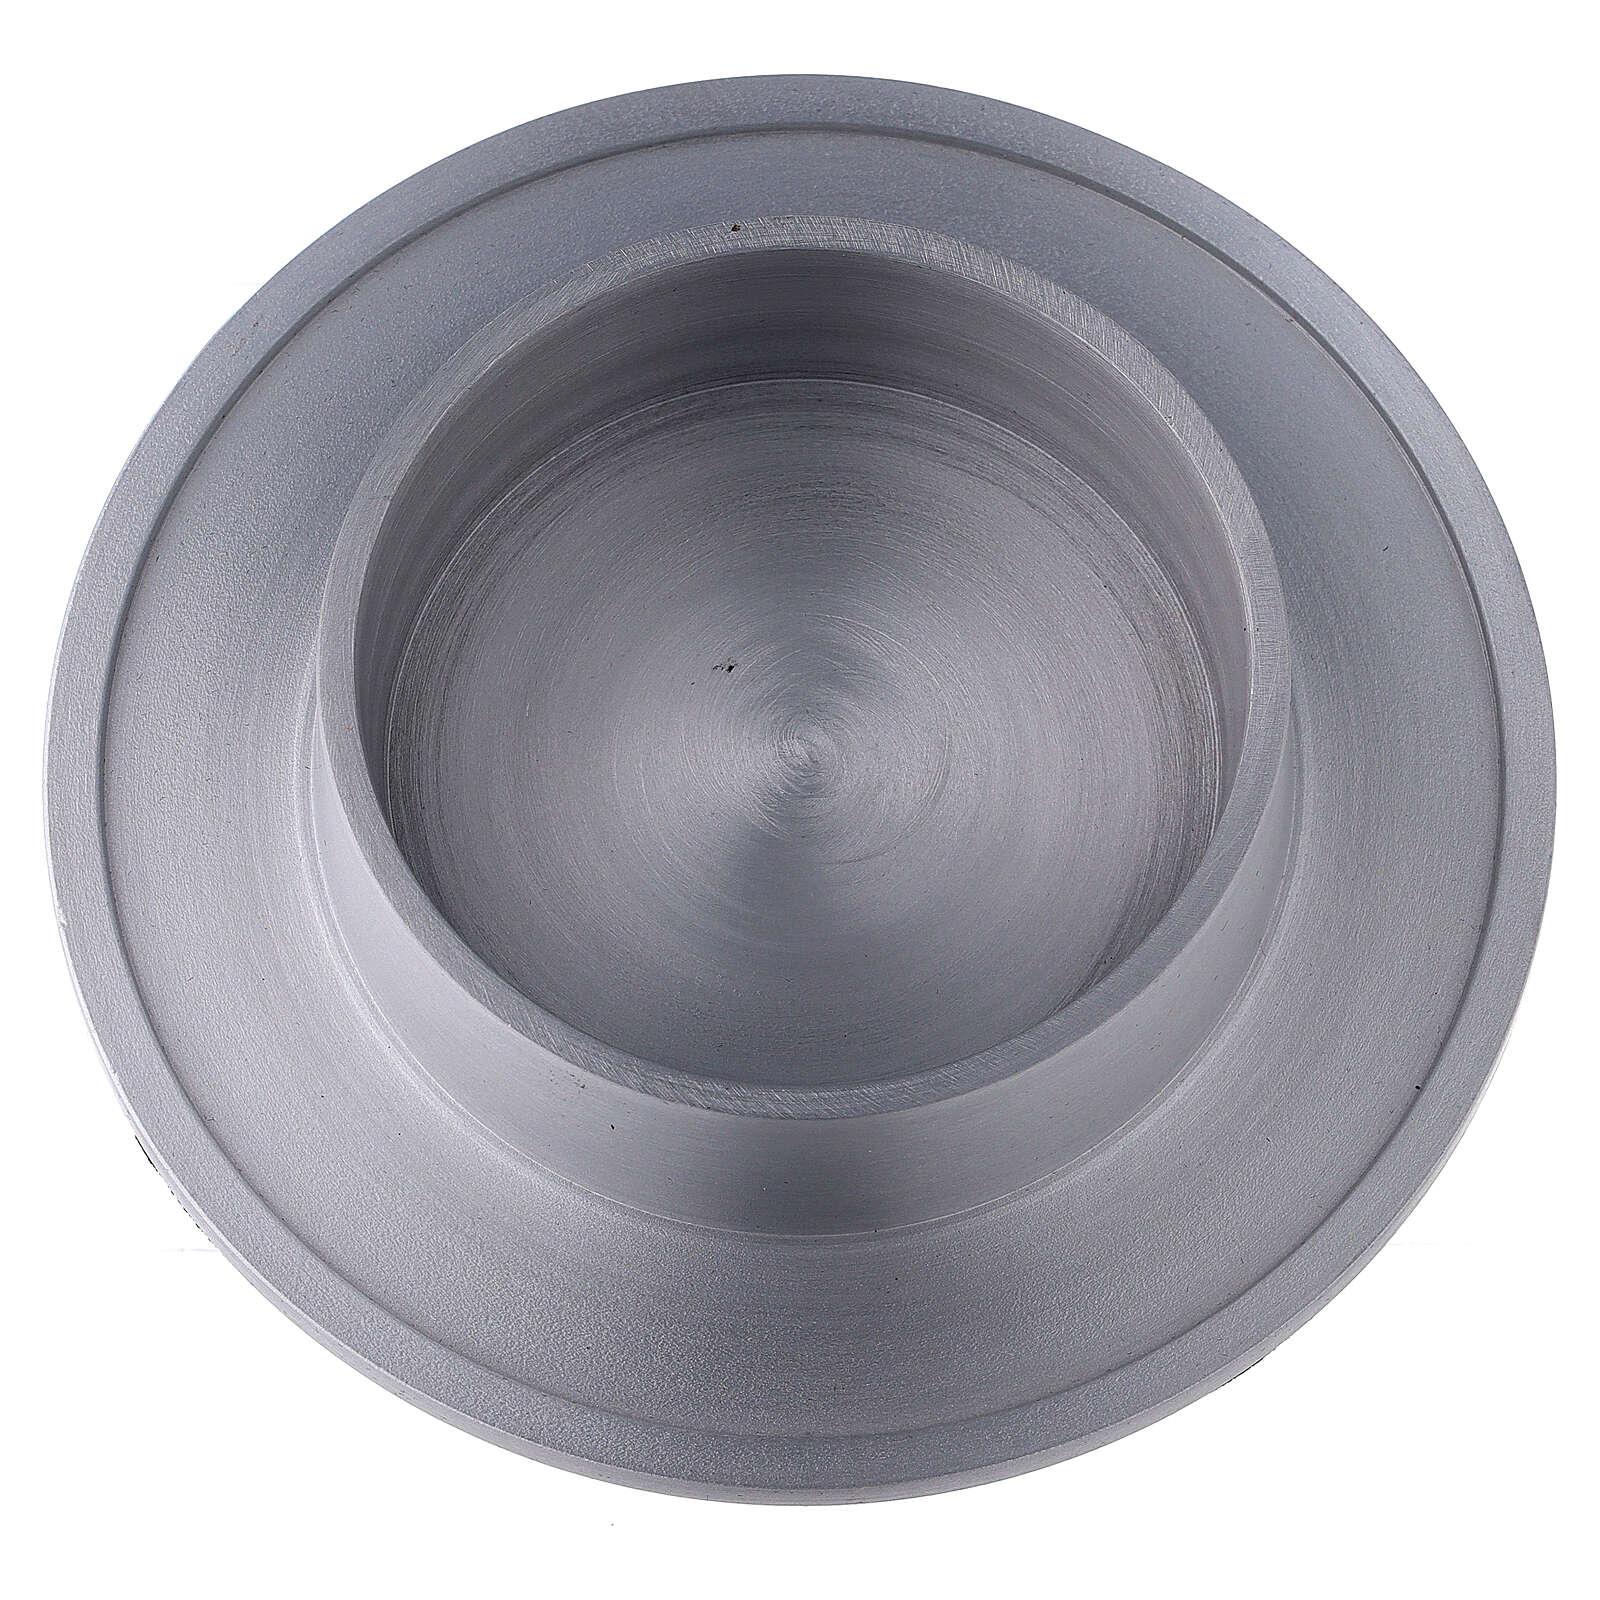 Portacandela alluminio satinato bordi 8 cm 4